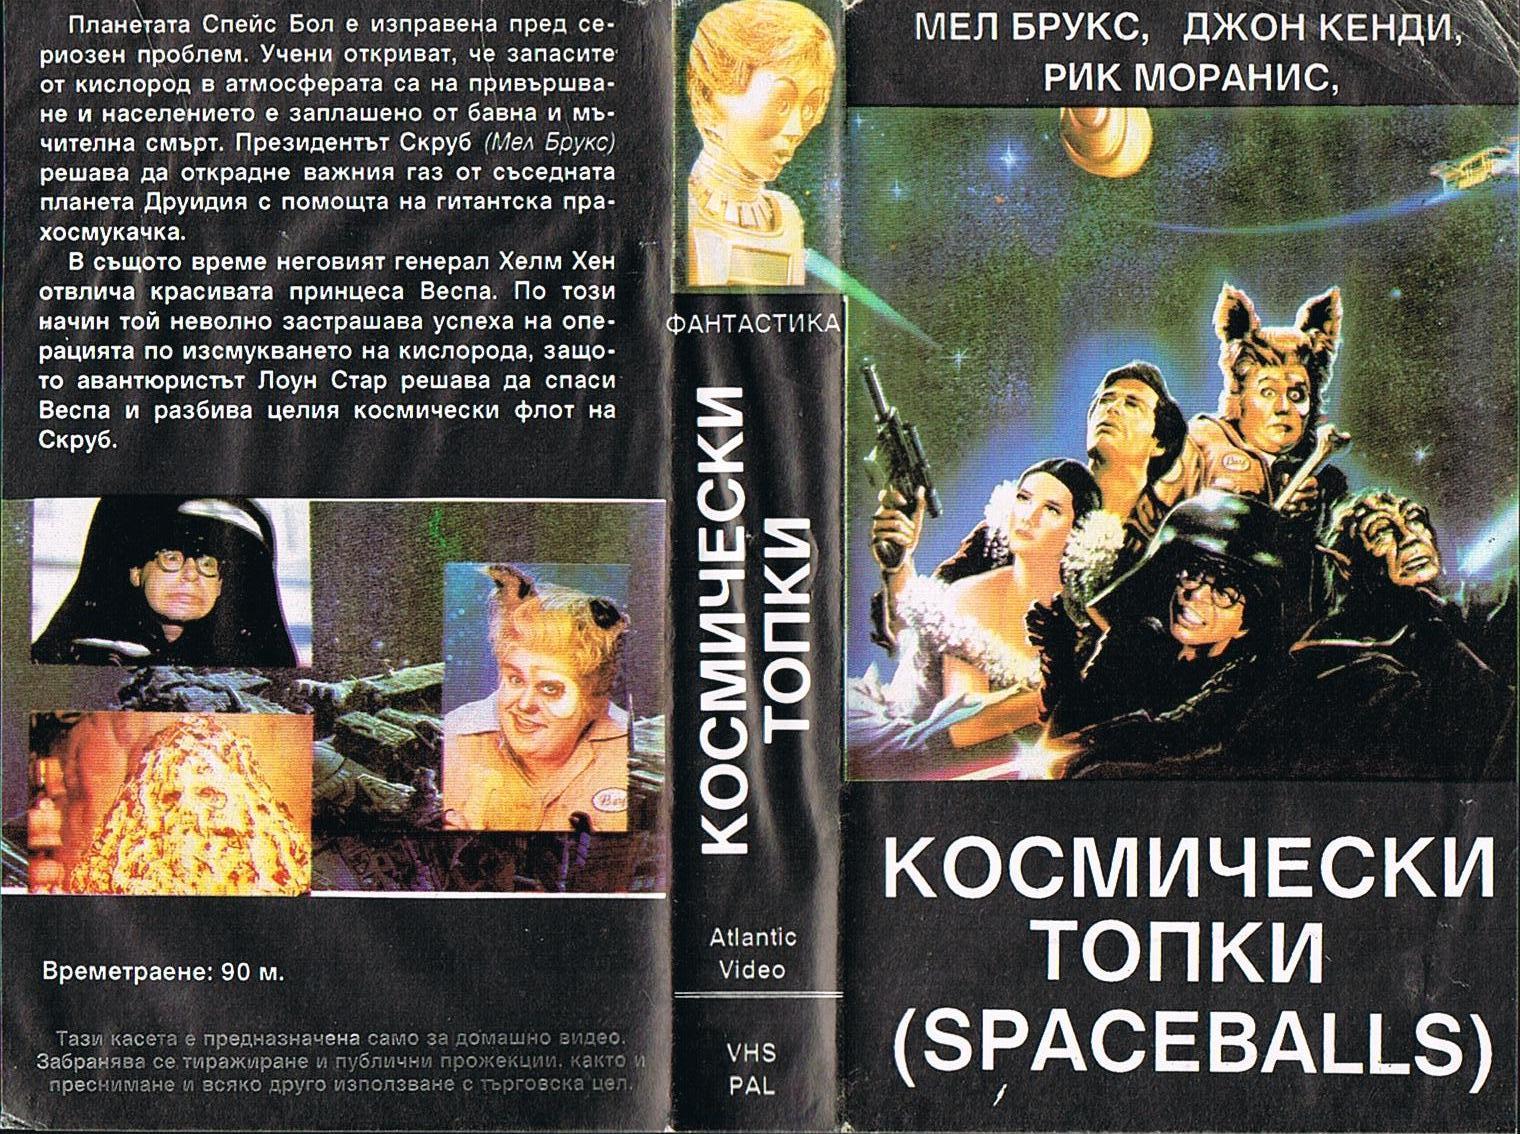 Космически топки филм постер